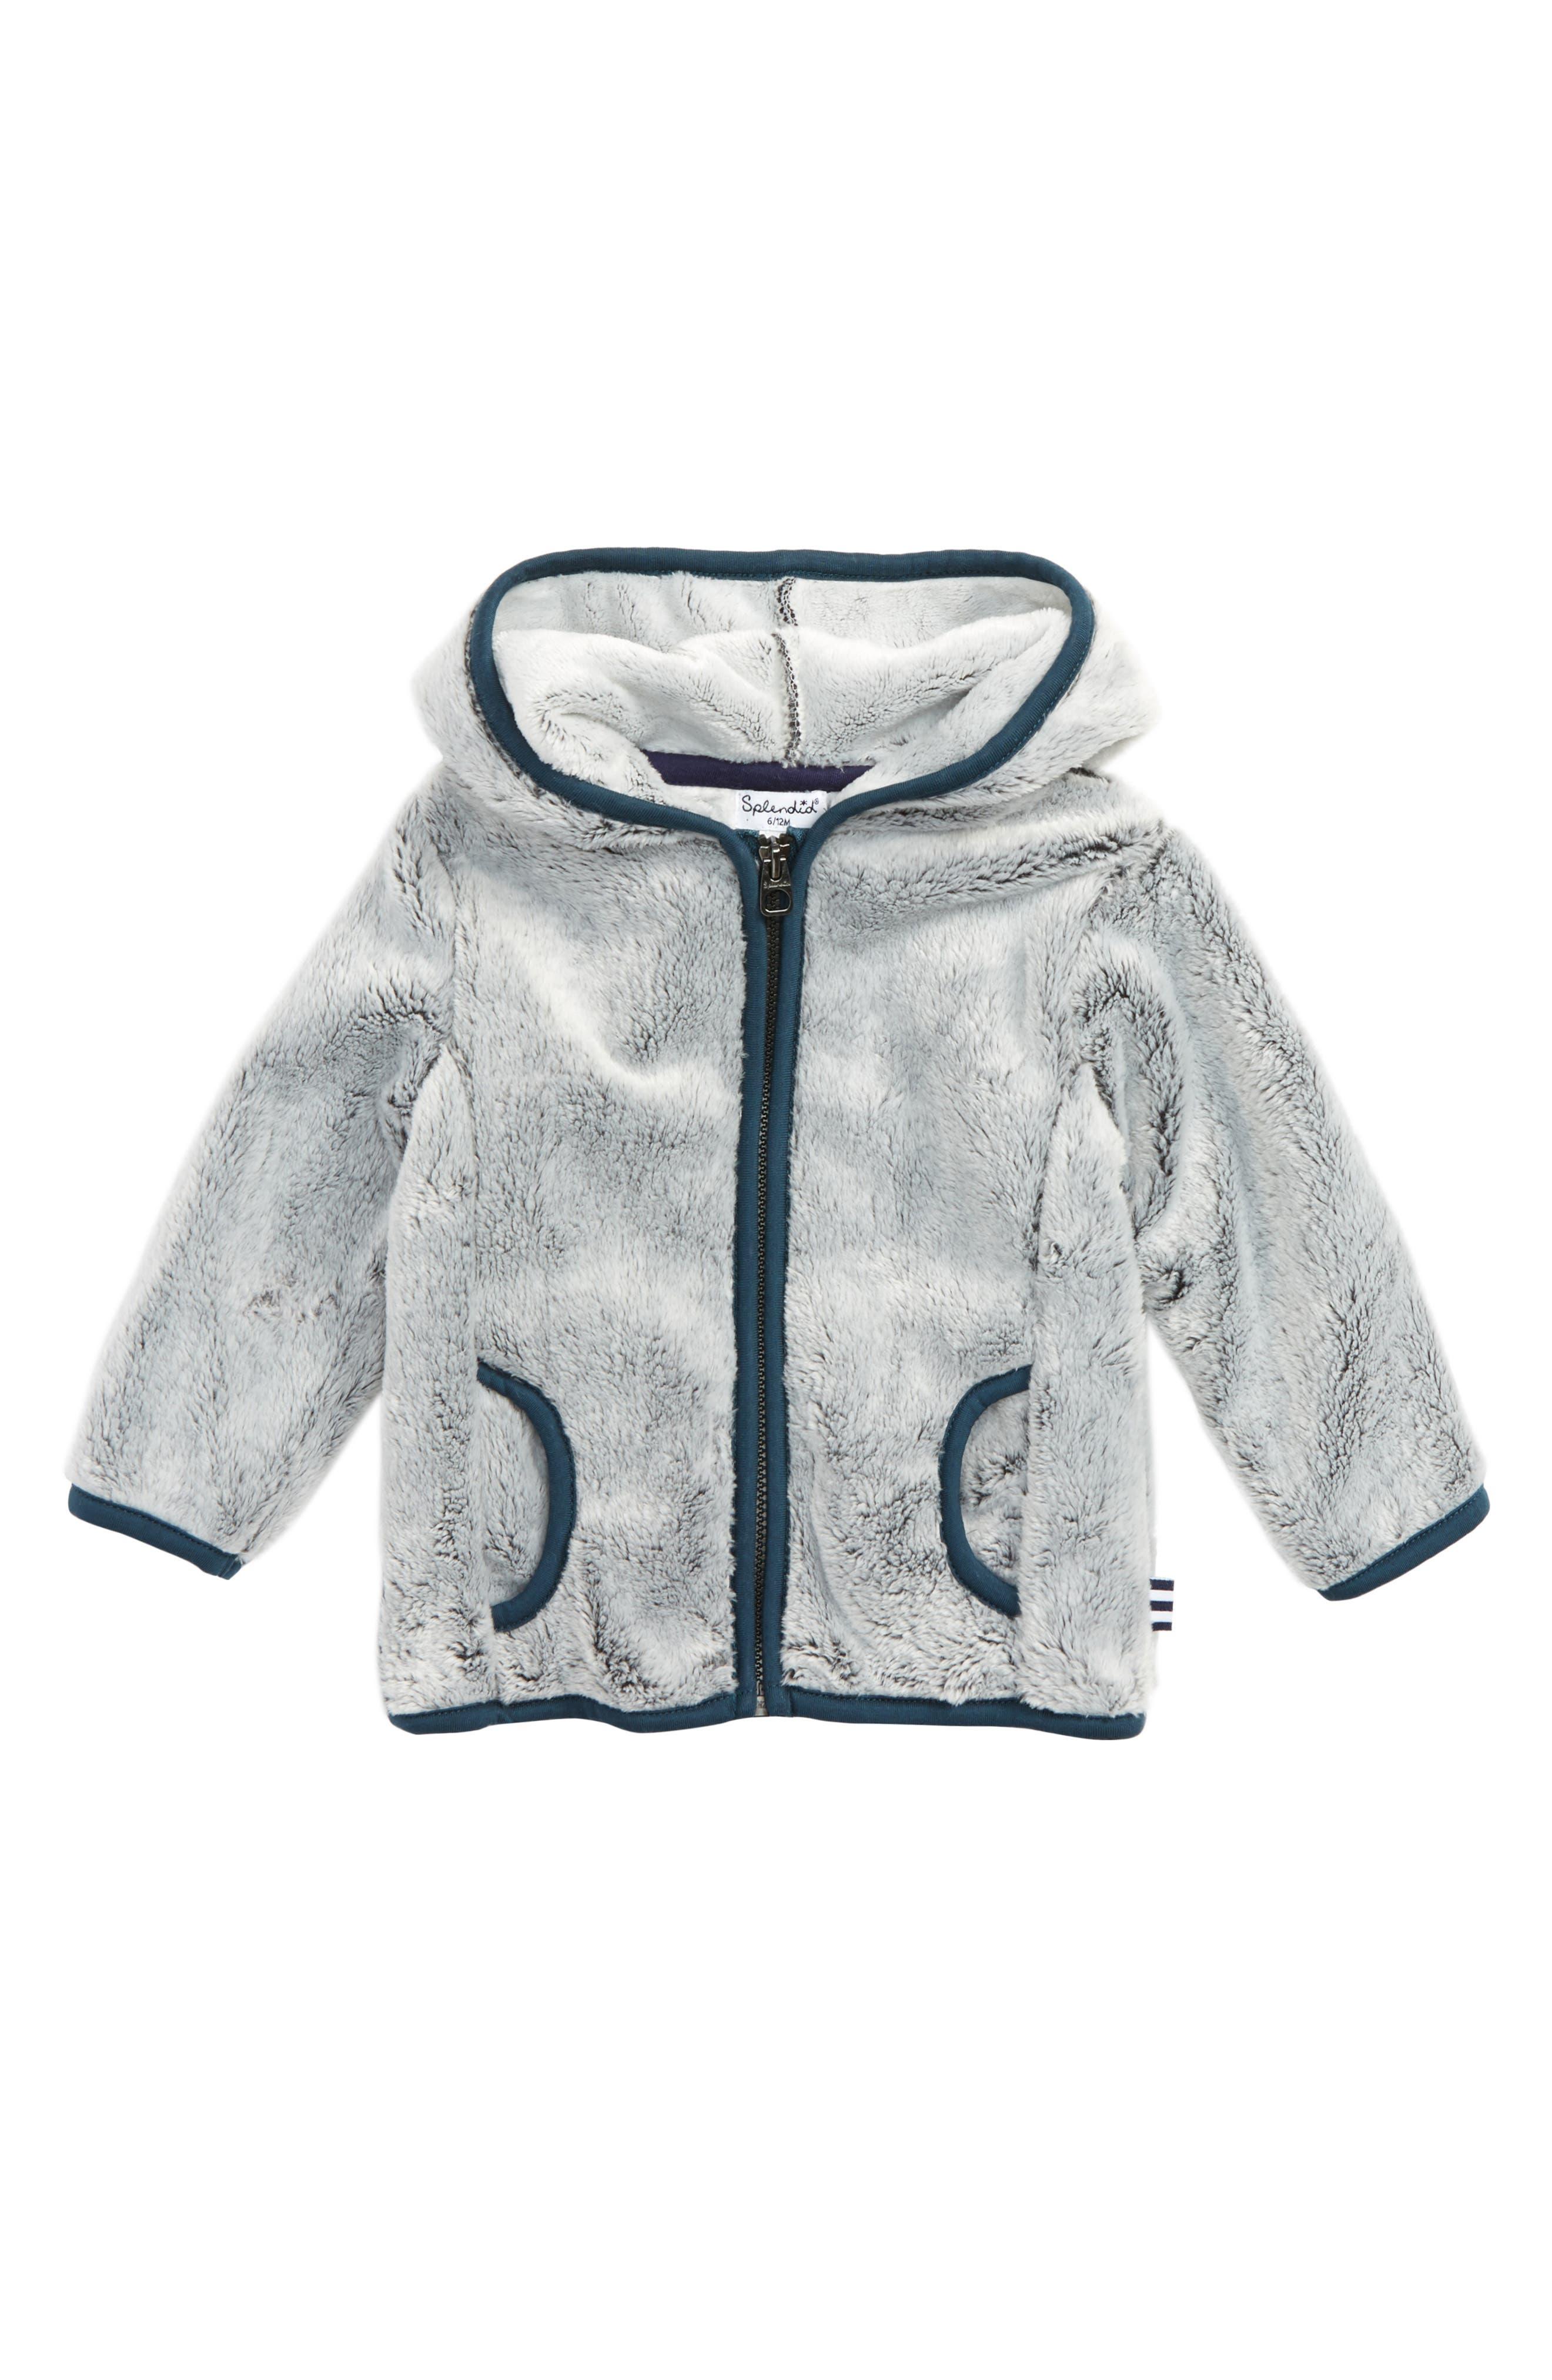 Hooded Fleece Jacket,                         Main,                         color, Grey Heather